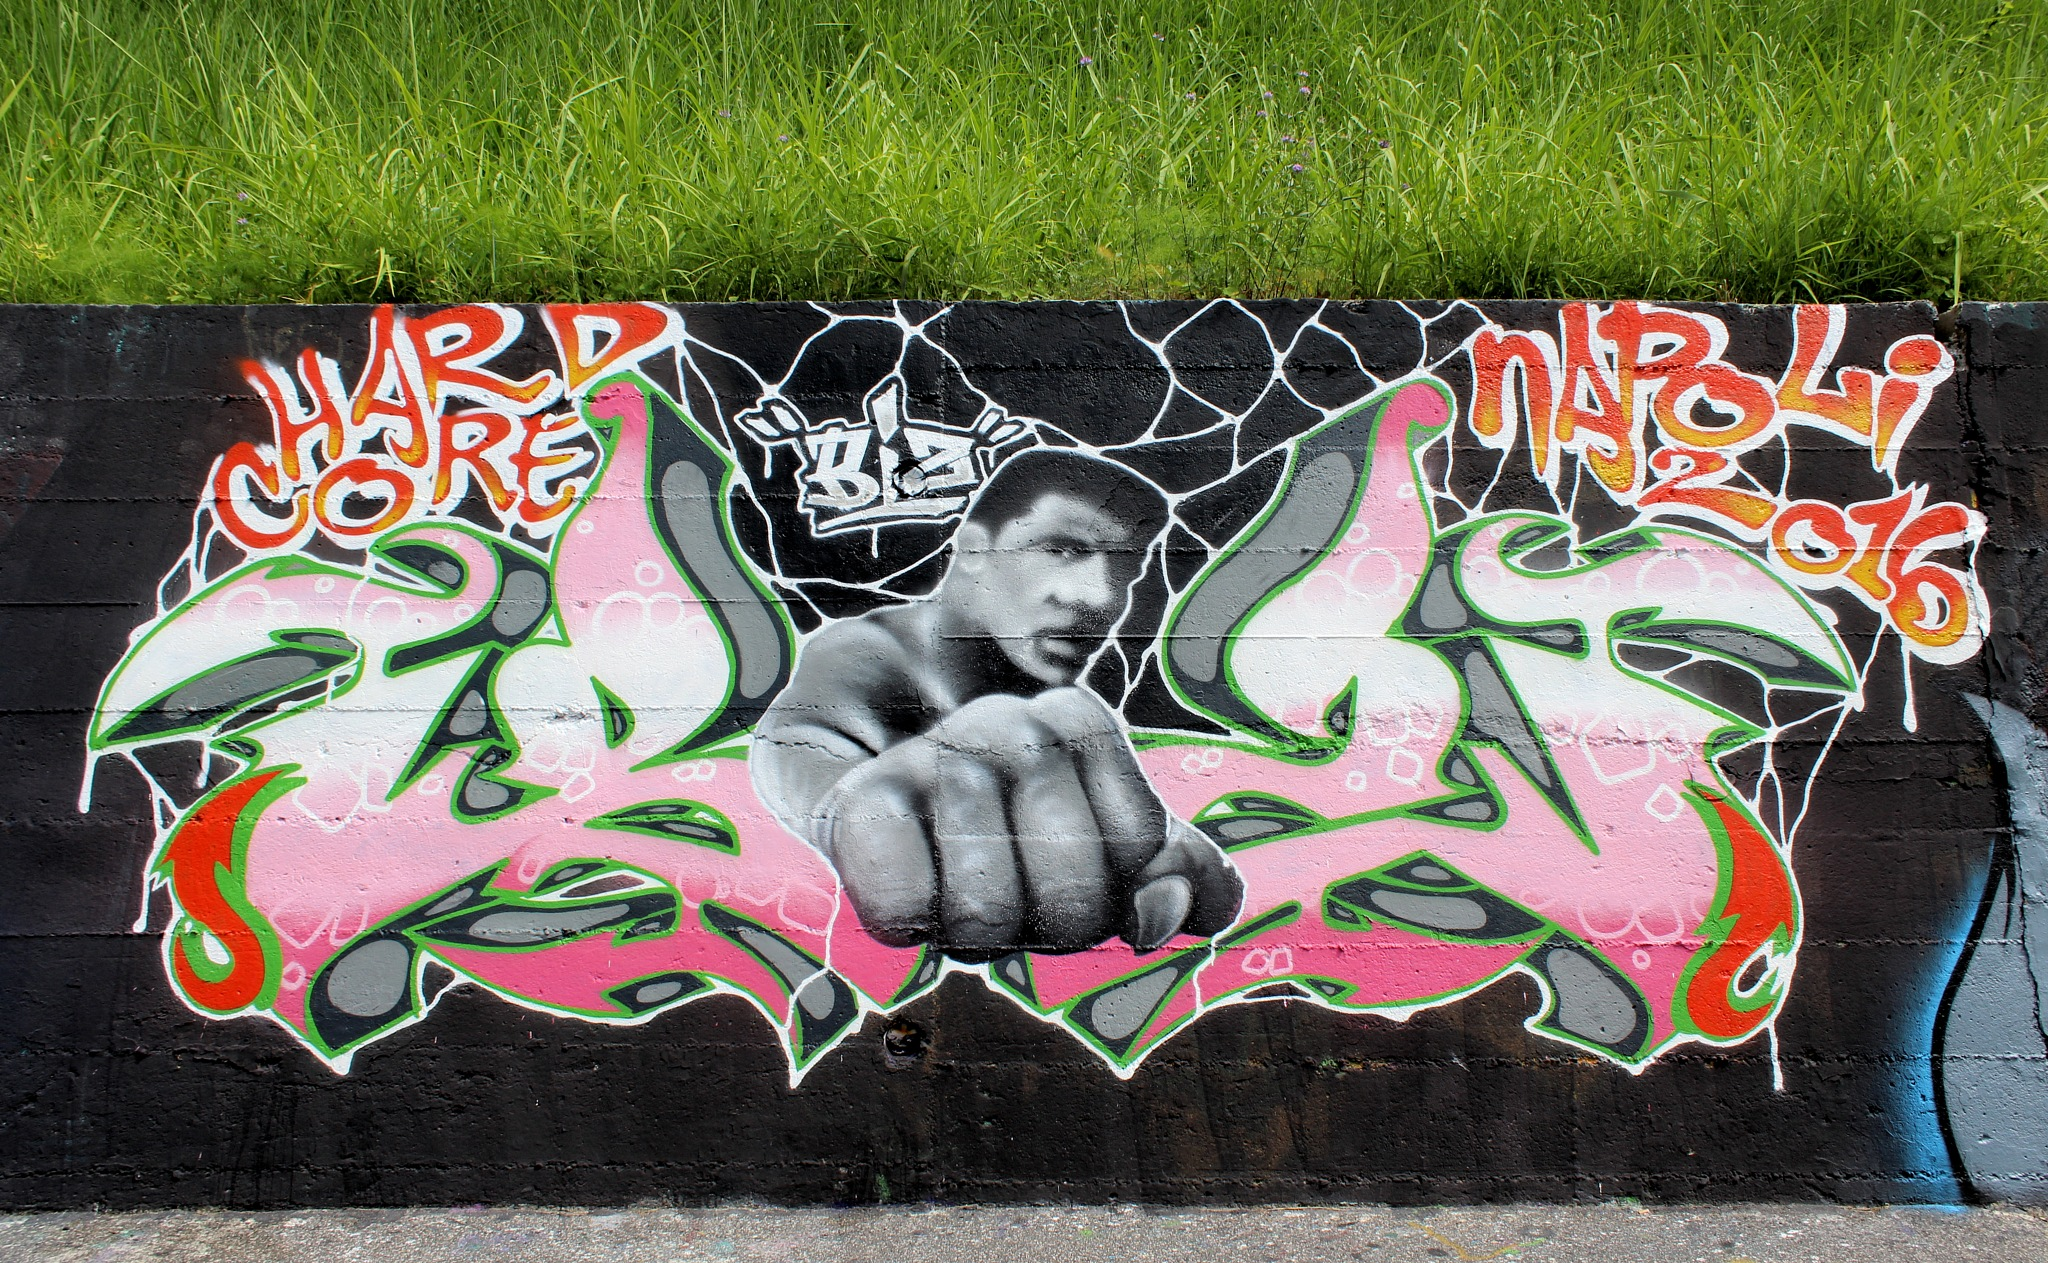 Naples - Street Art - Bagnoli - Biz Hard Core - 2016 - Muhammad Alí Cassius Clay - 1b by Arnaldo De Lisio